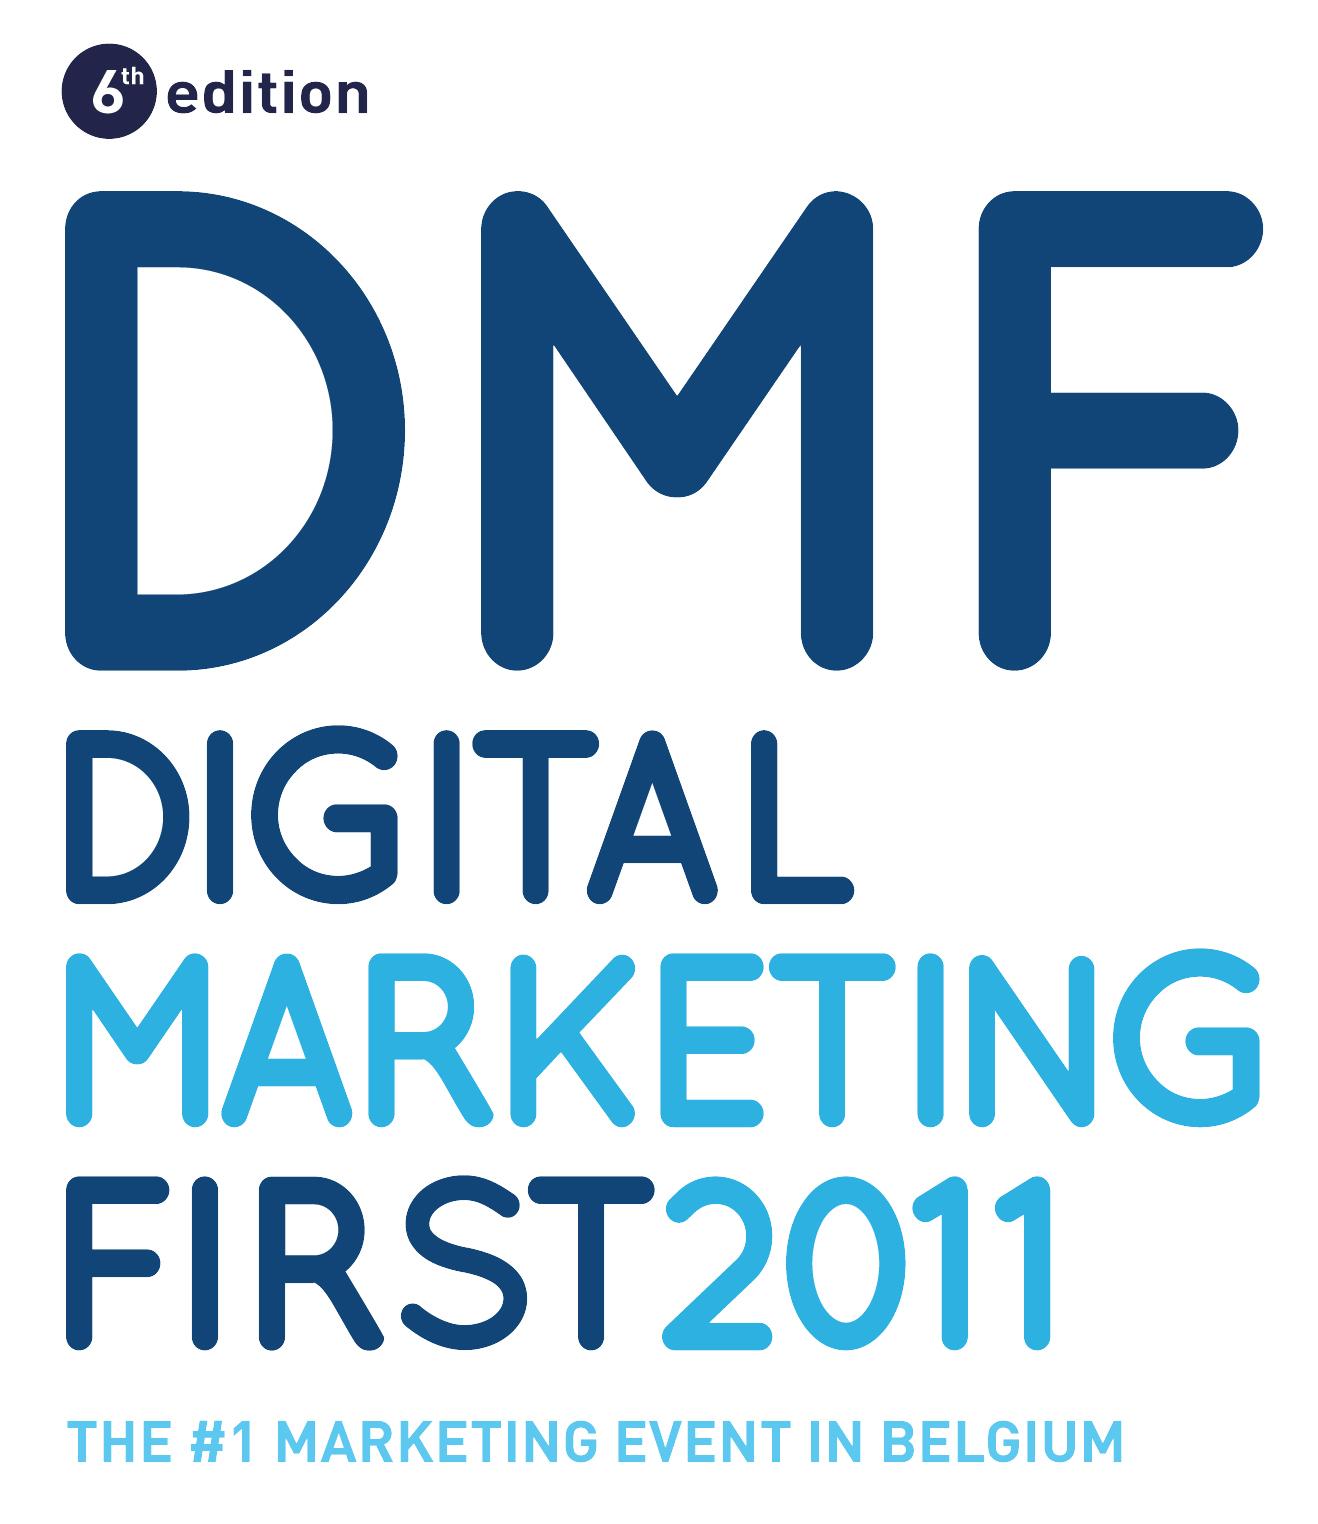 Digital Marketing First